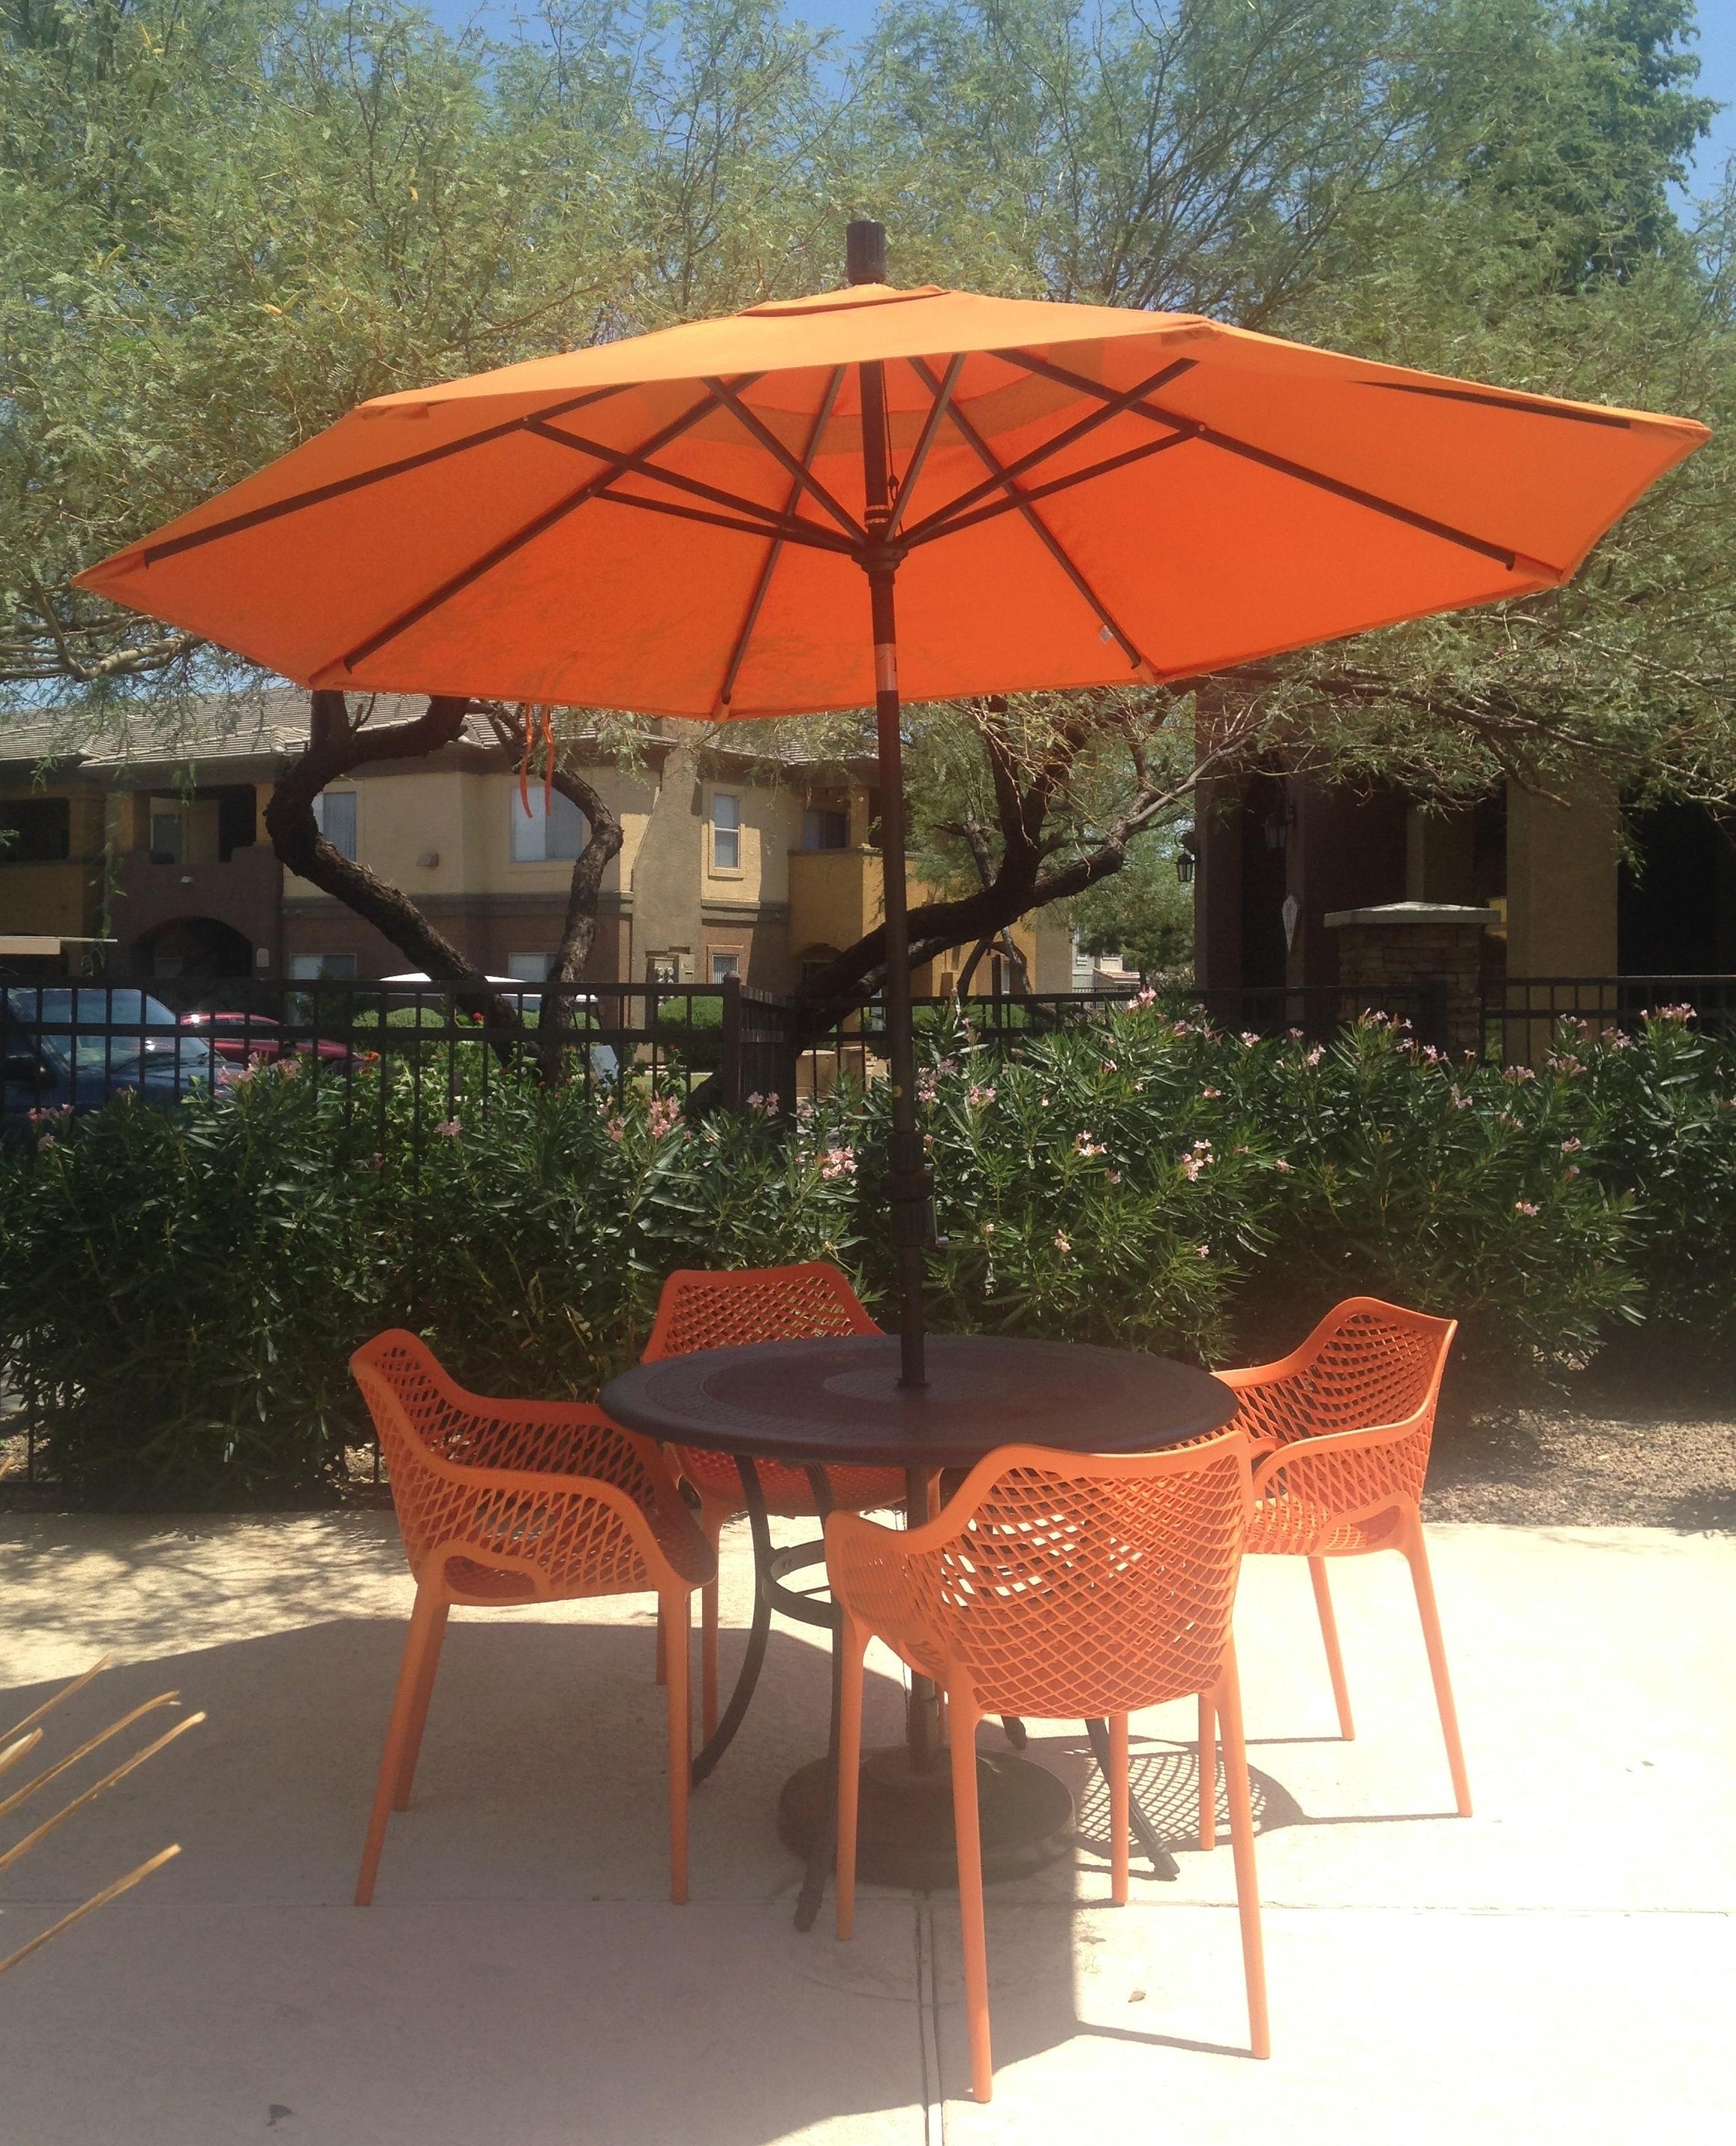 Well Known Photo Of Target Patio Umbrella Exterior Orange Target Patio Regarding Small Patio Umbrellas (View 20 of 20)